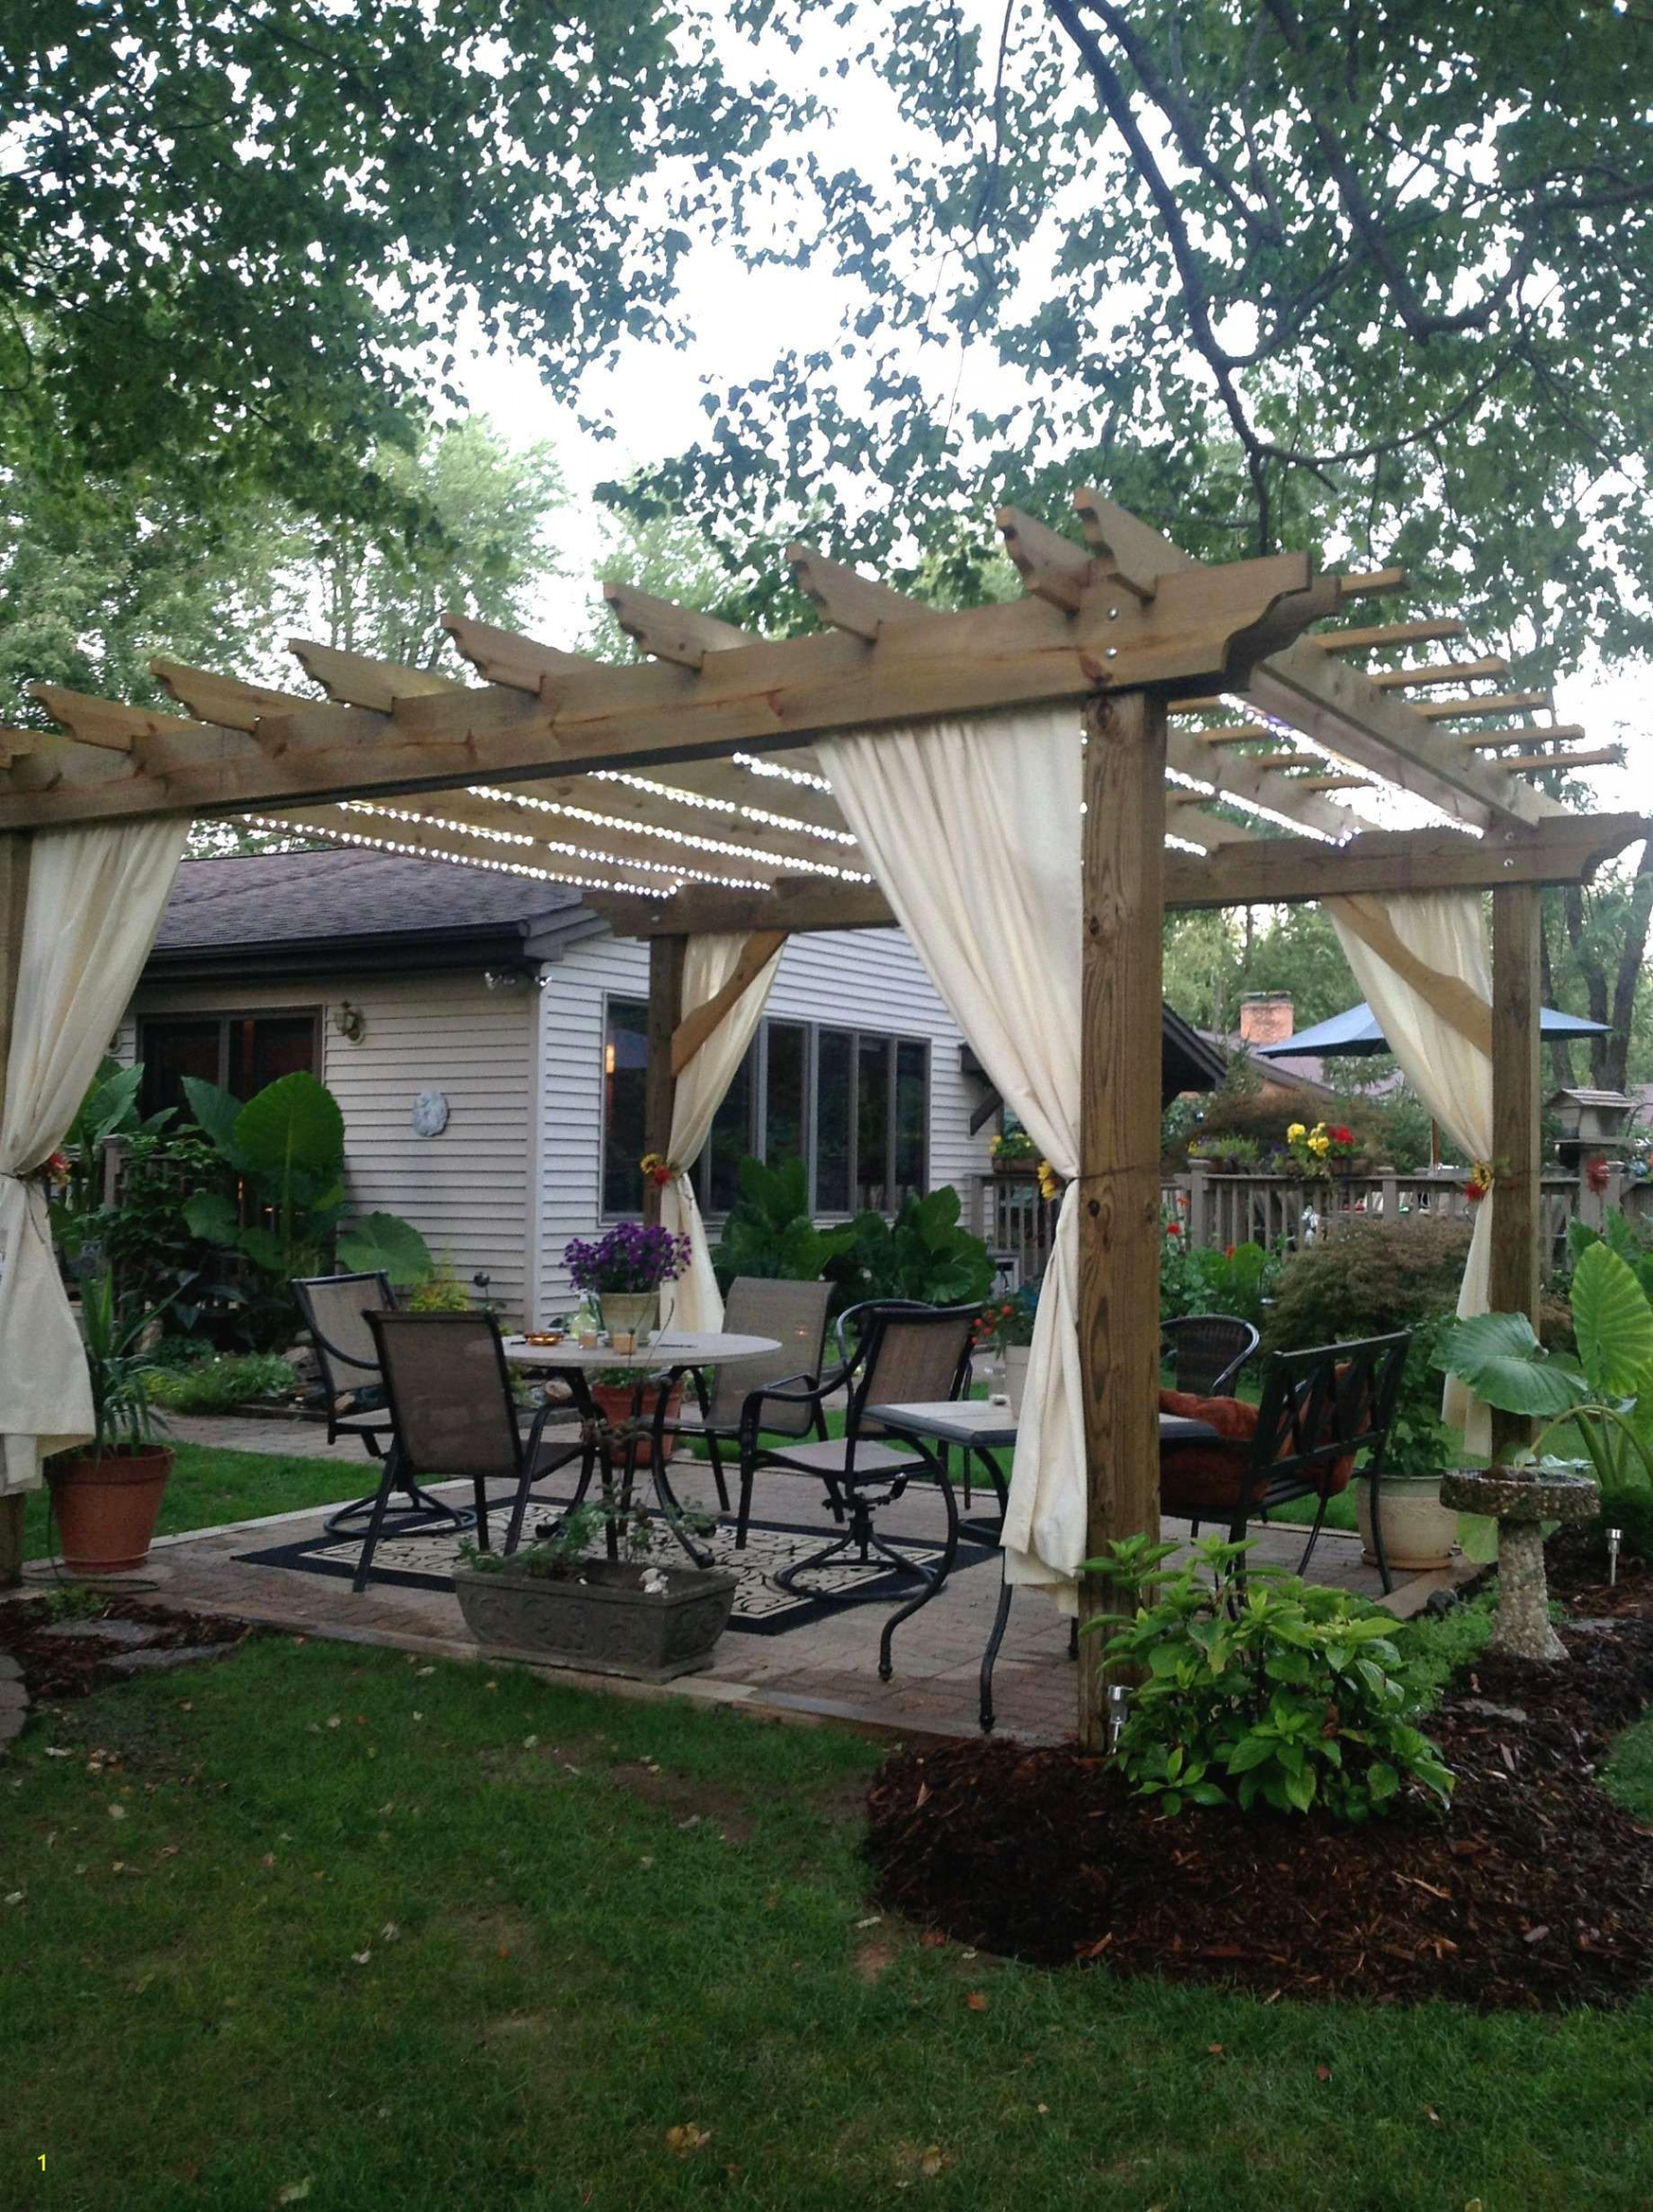 Alte Türen Im Garten Dekorieren Neu Billy Türen Alternative — Temobardz Home Blog